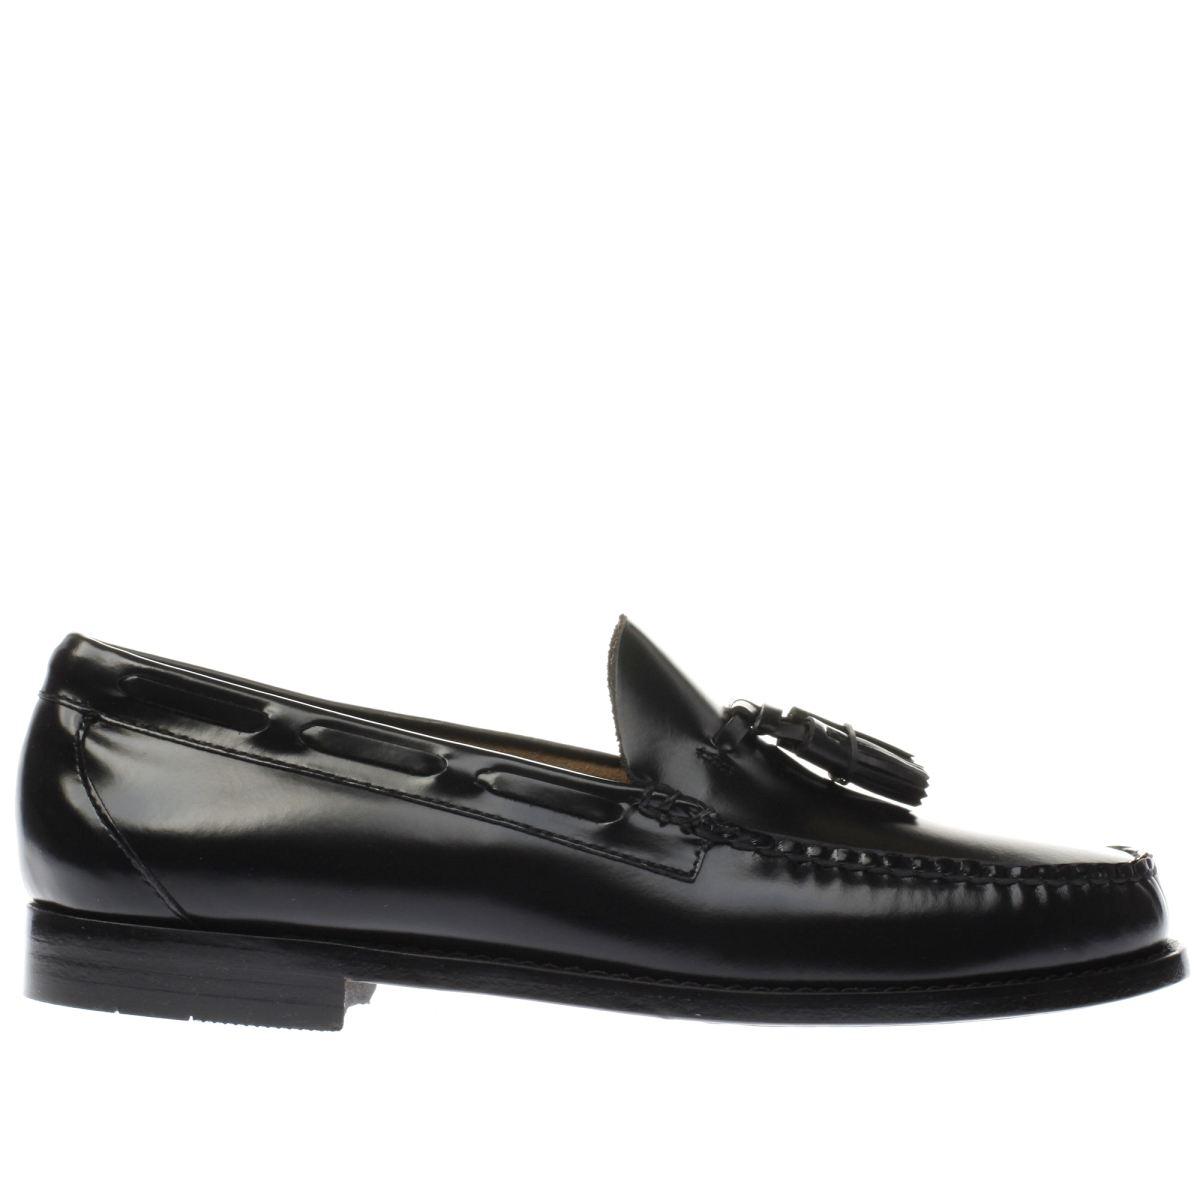 bass black larkin moccasin tassle shoes